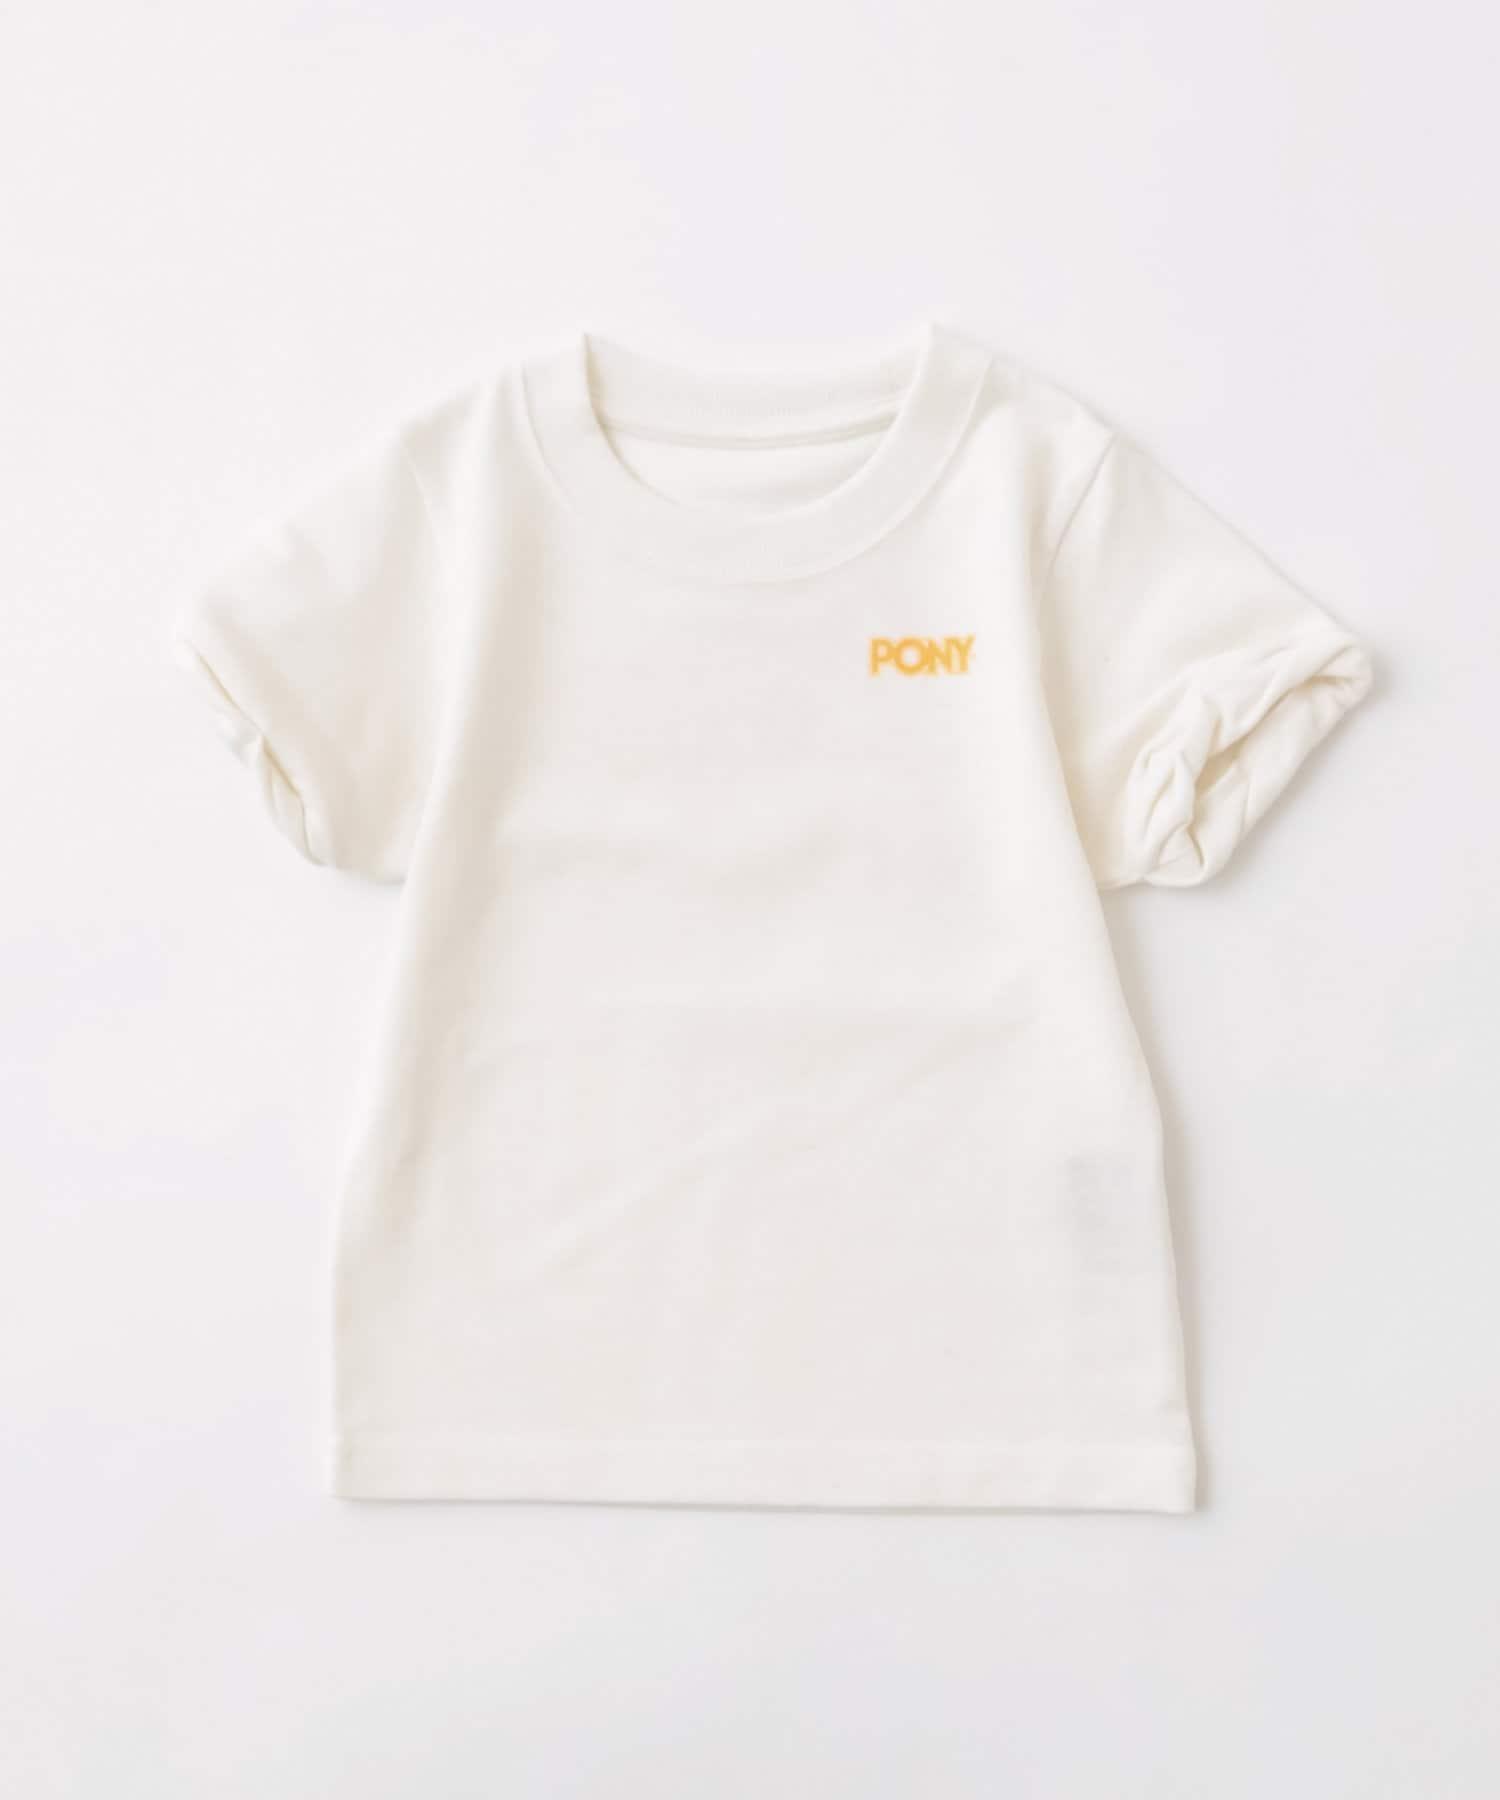 who's who Chico(フーズフーチコ) Kids PONYネオンバックロゴ半袖Tシャツ